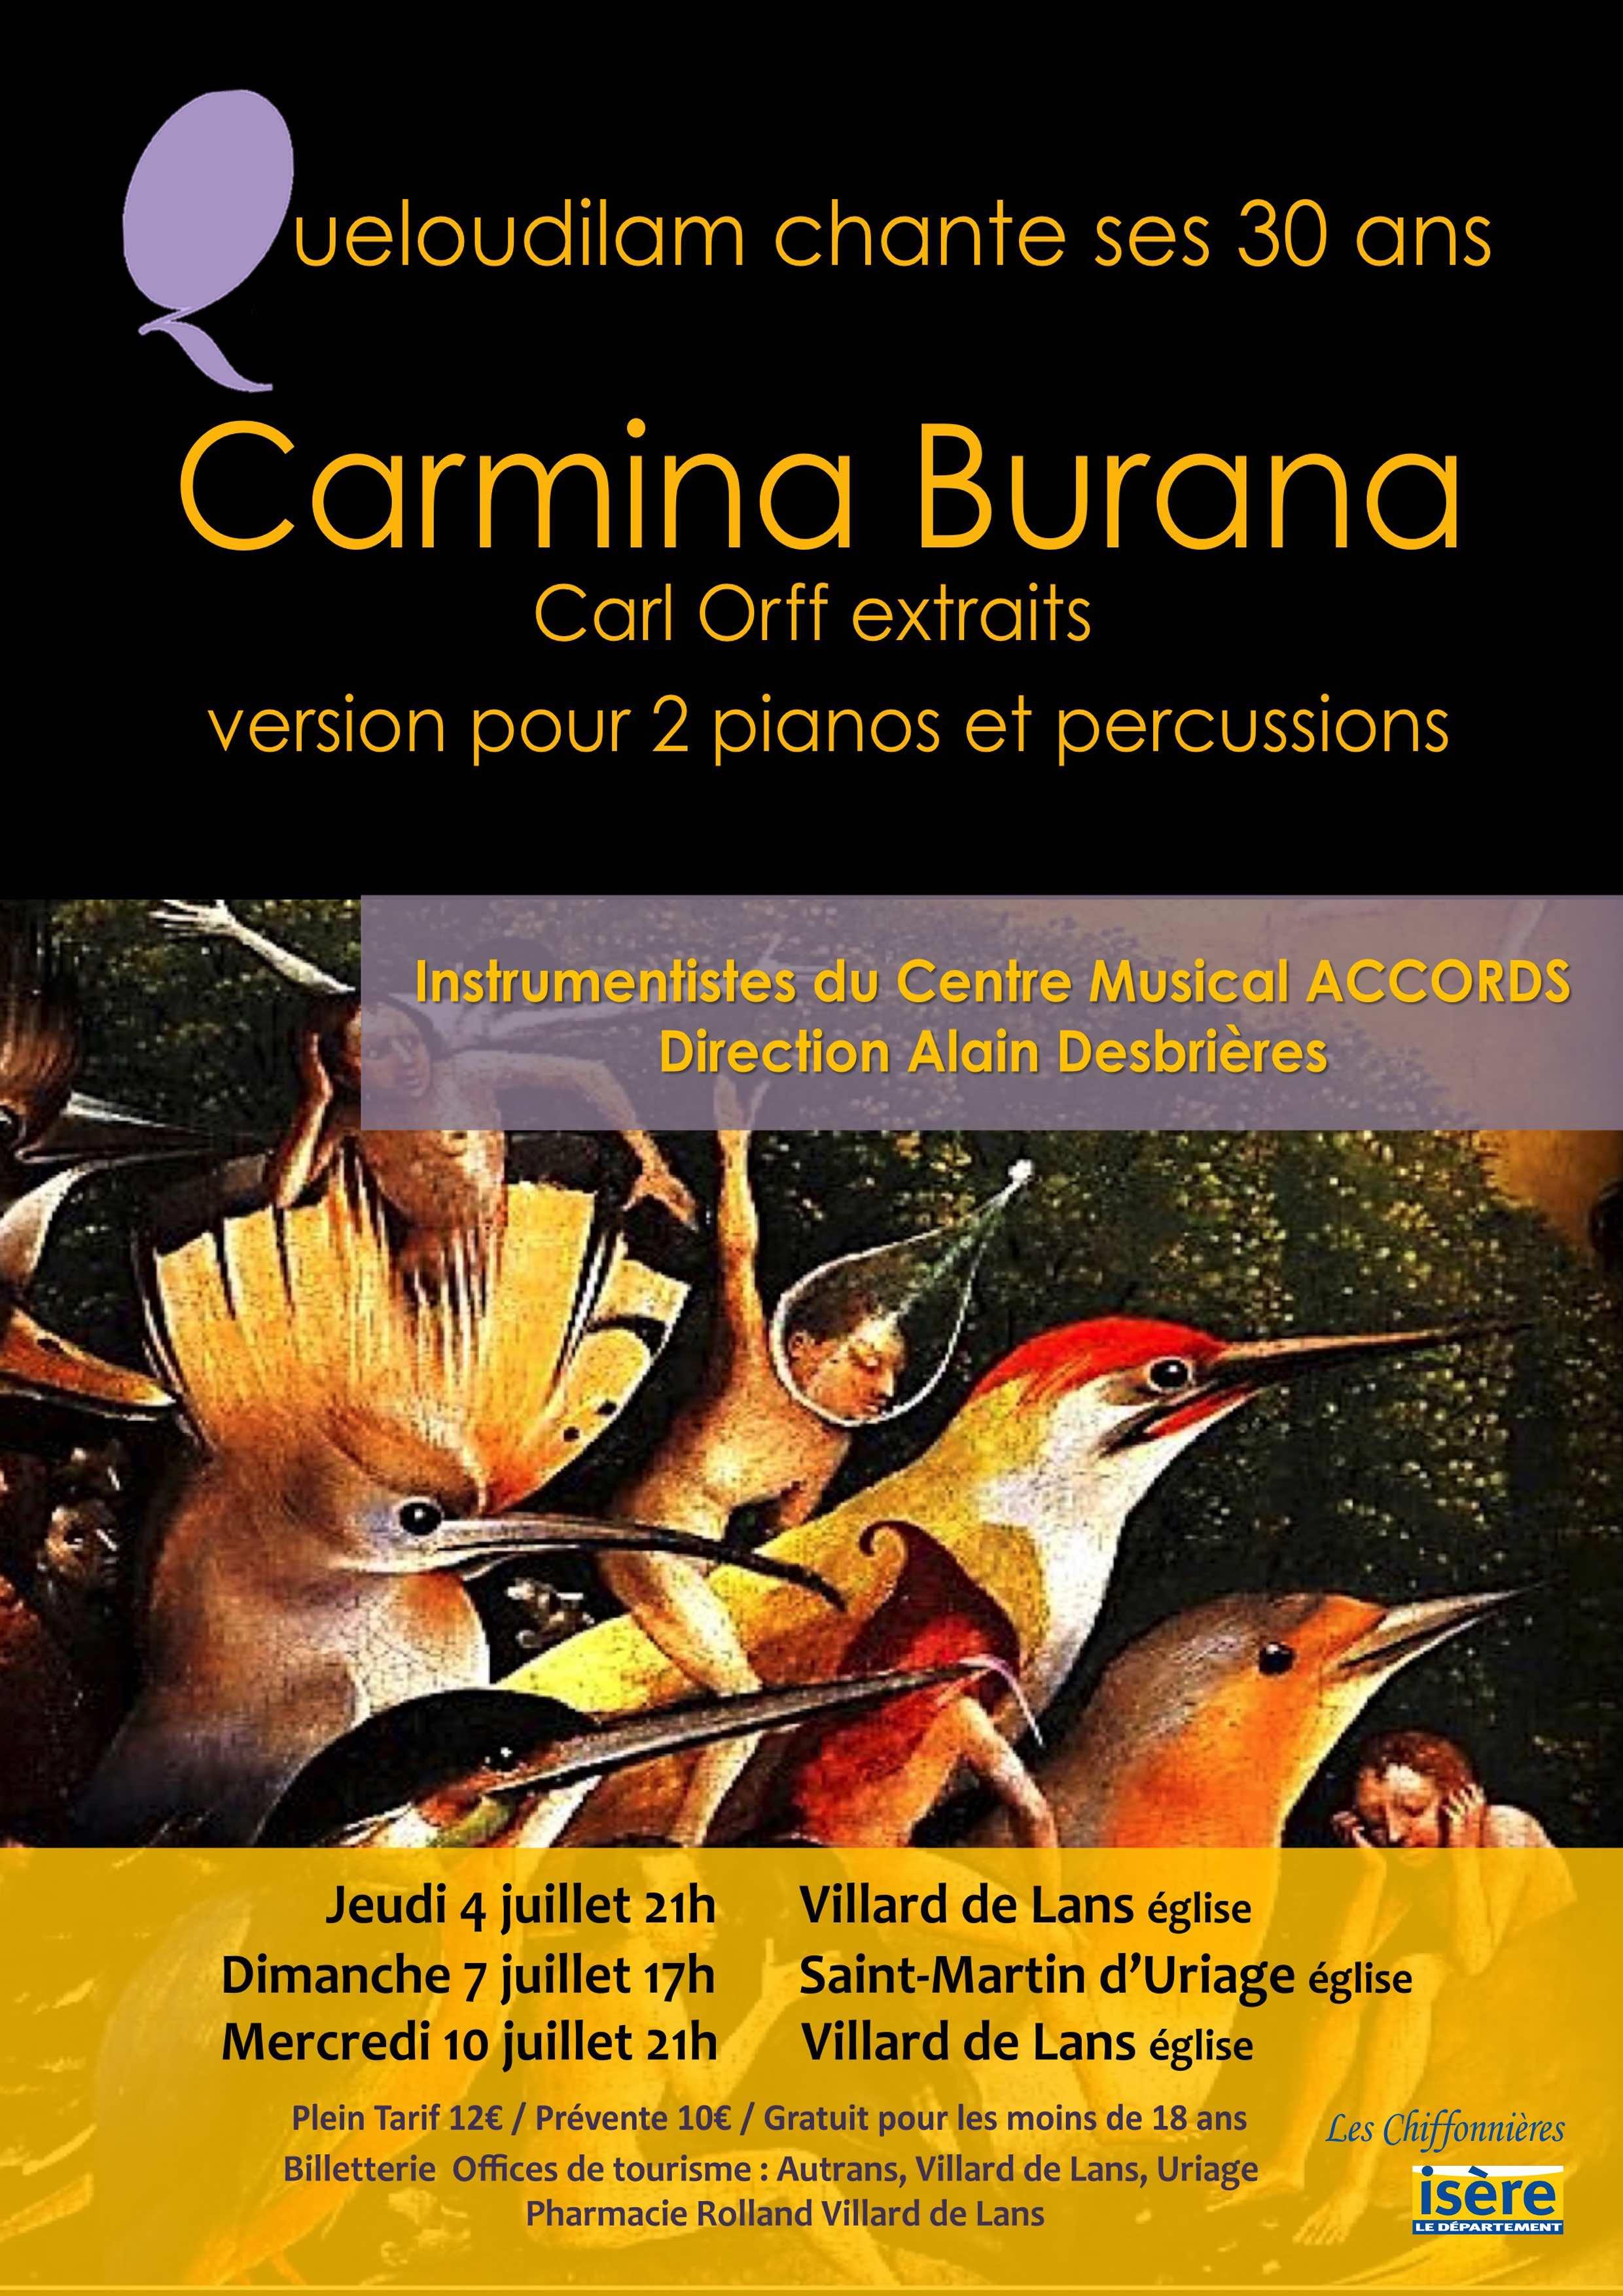 afficge-Carmina-Burana